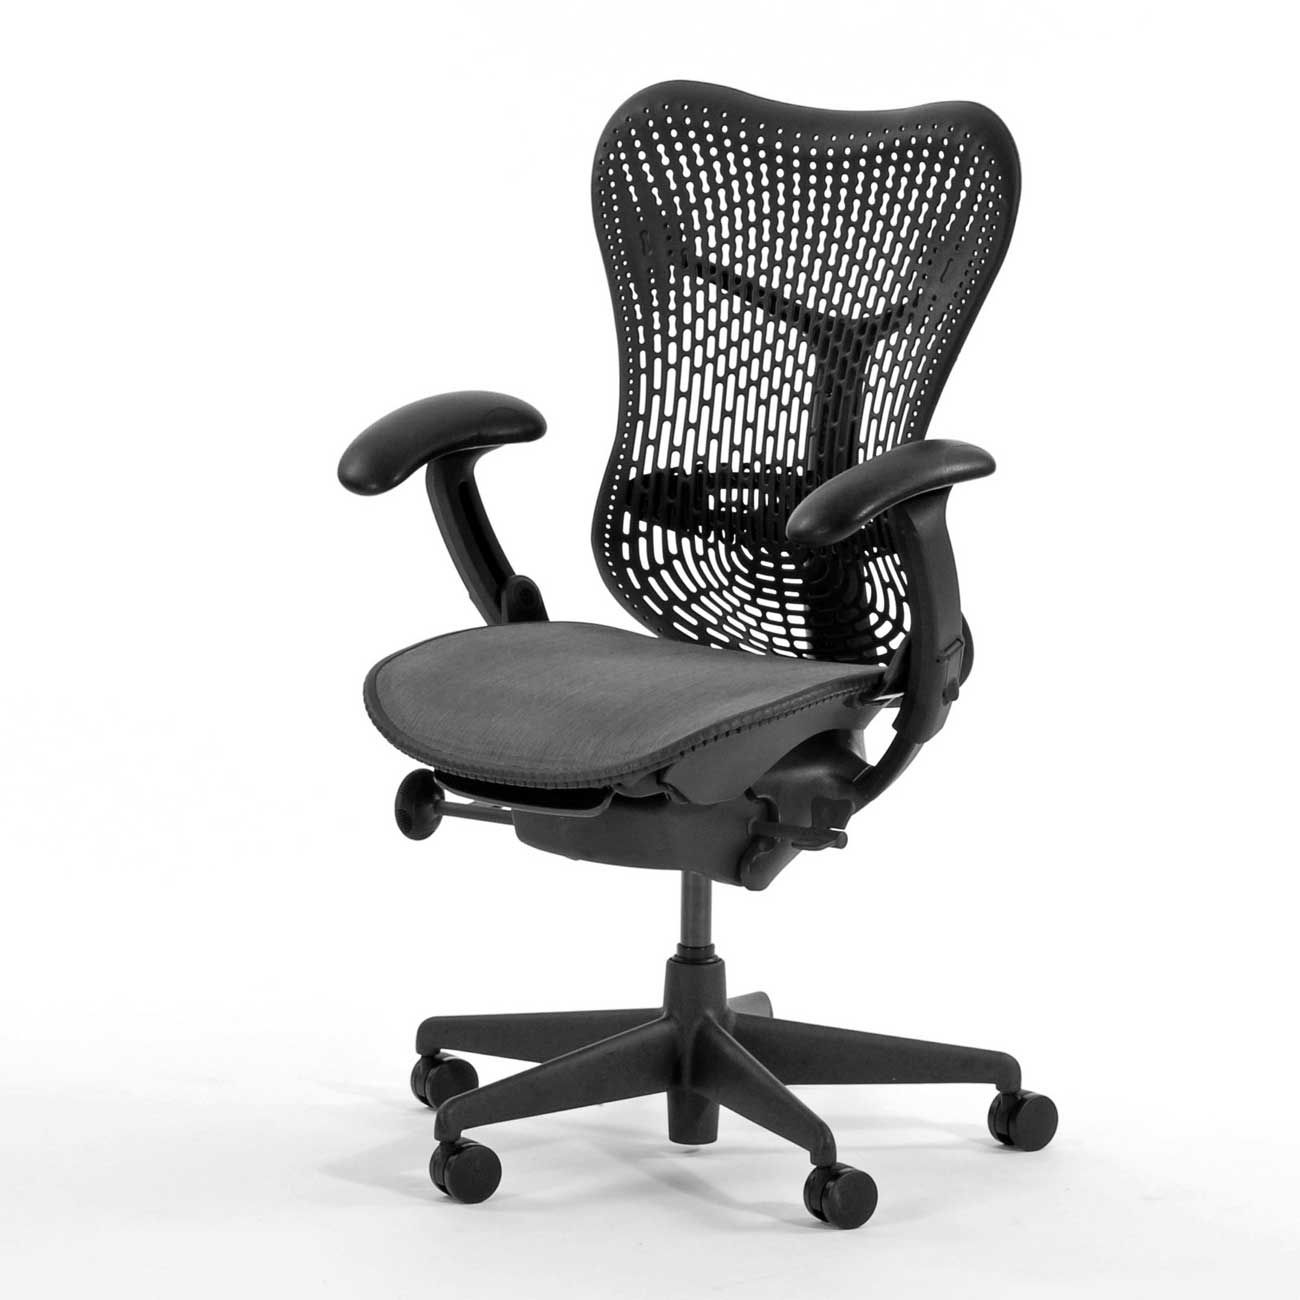 Mesh Desk Chair Herman Miller   http://devintavern.com   Pinterest ...